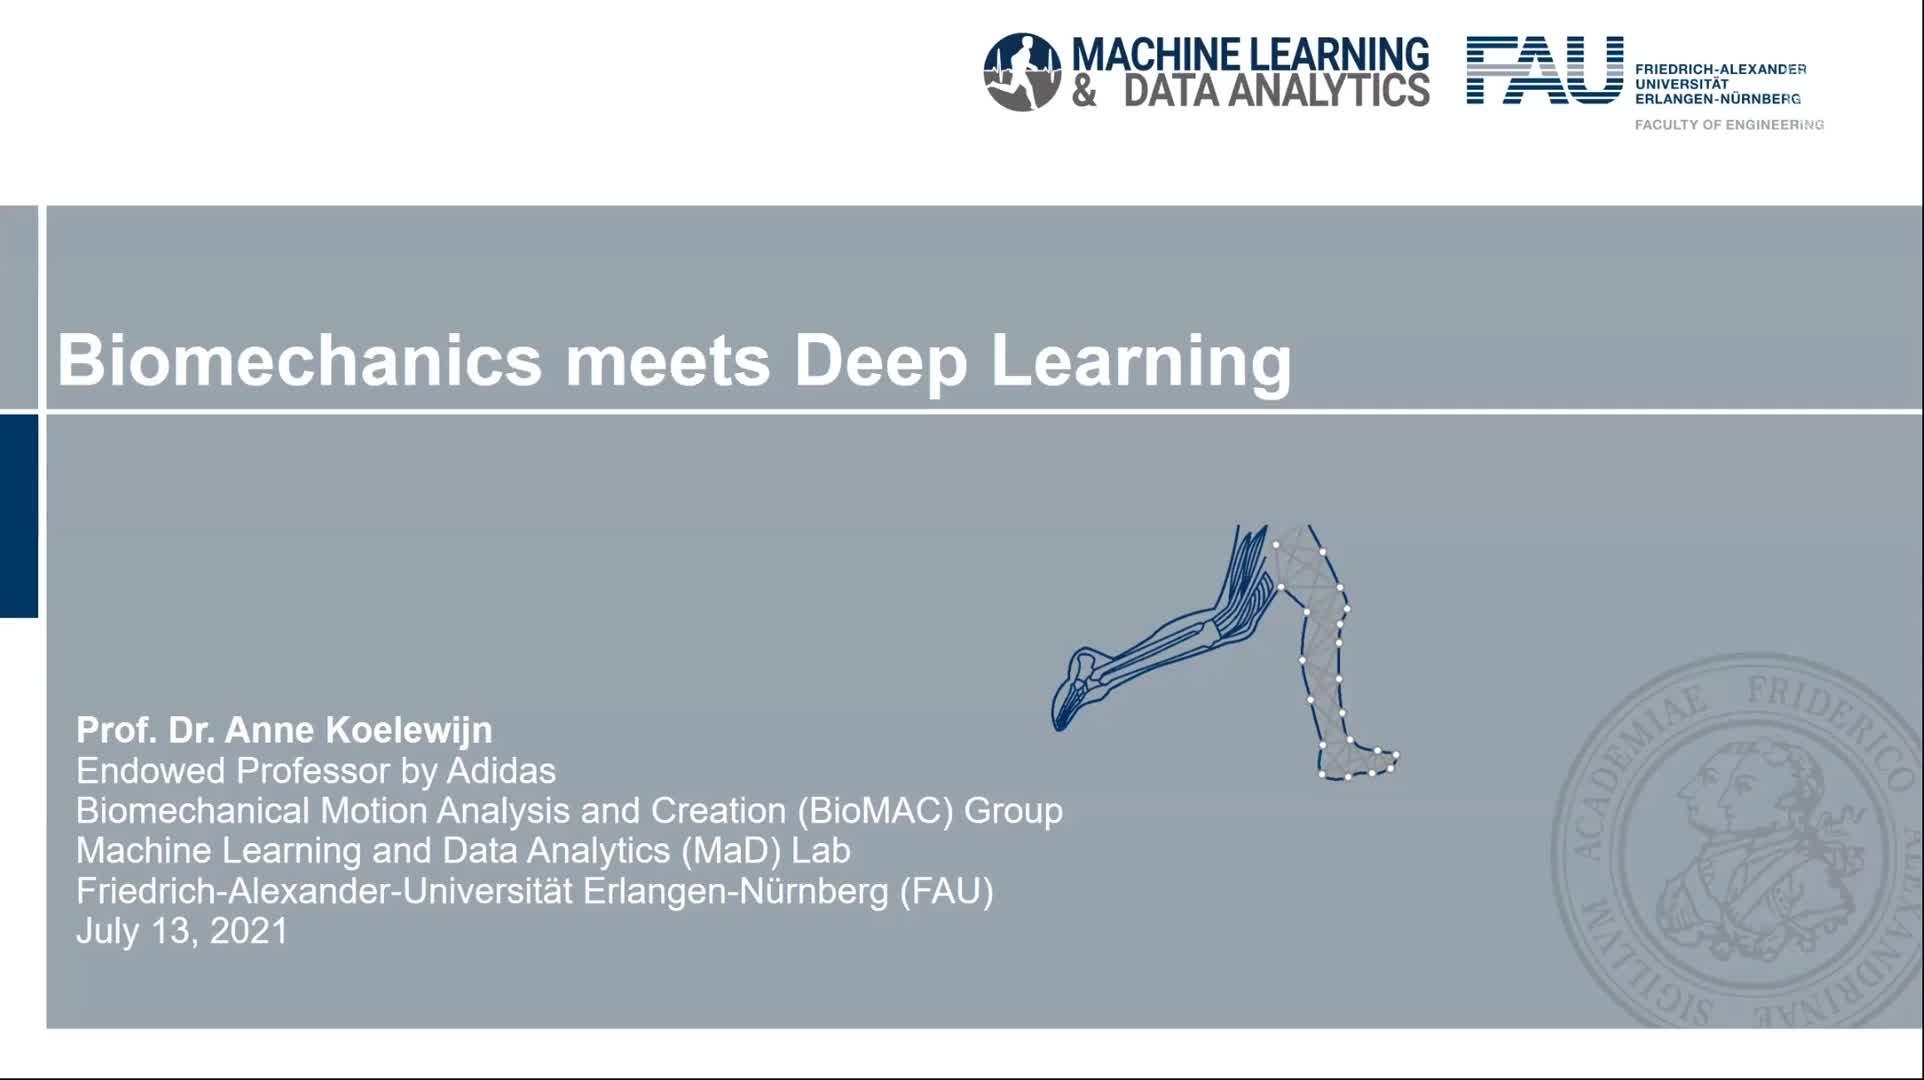 Biomechanics meets Deep Learning preview image